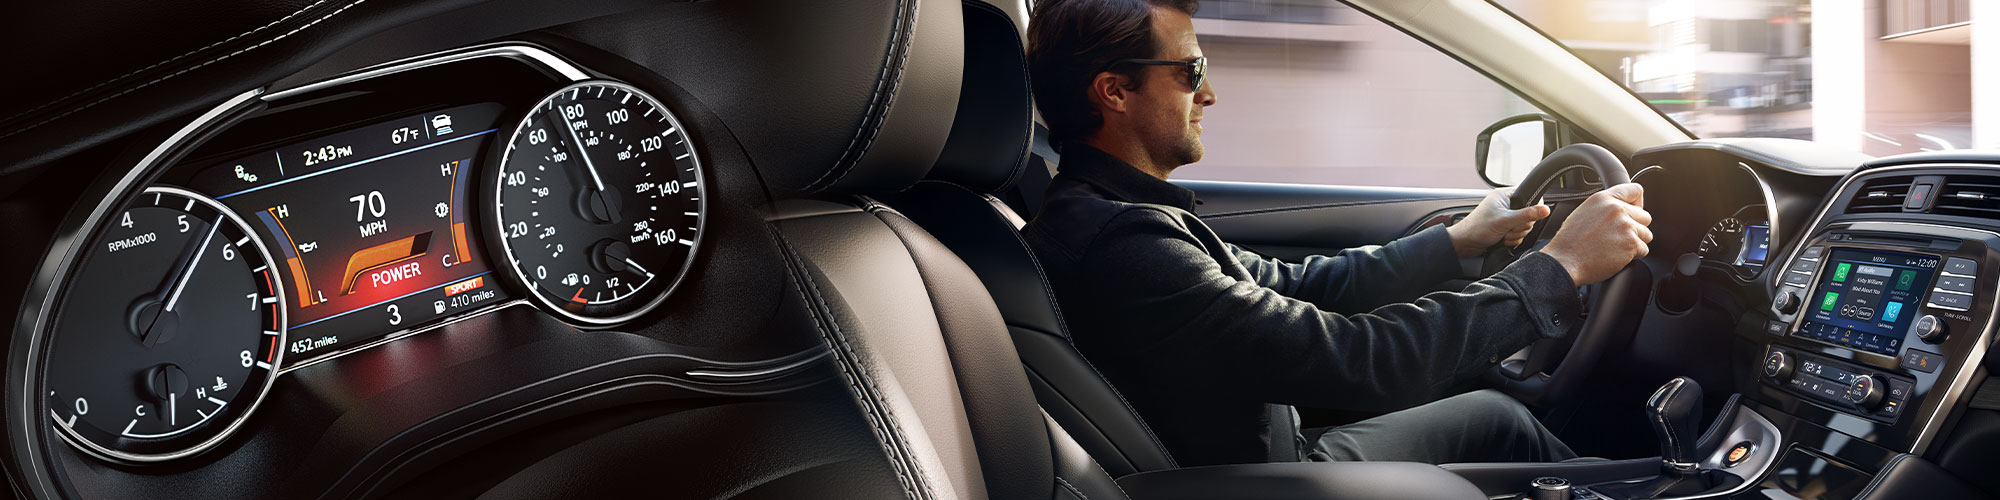 2019 Nissan Maxima price